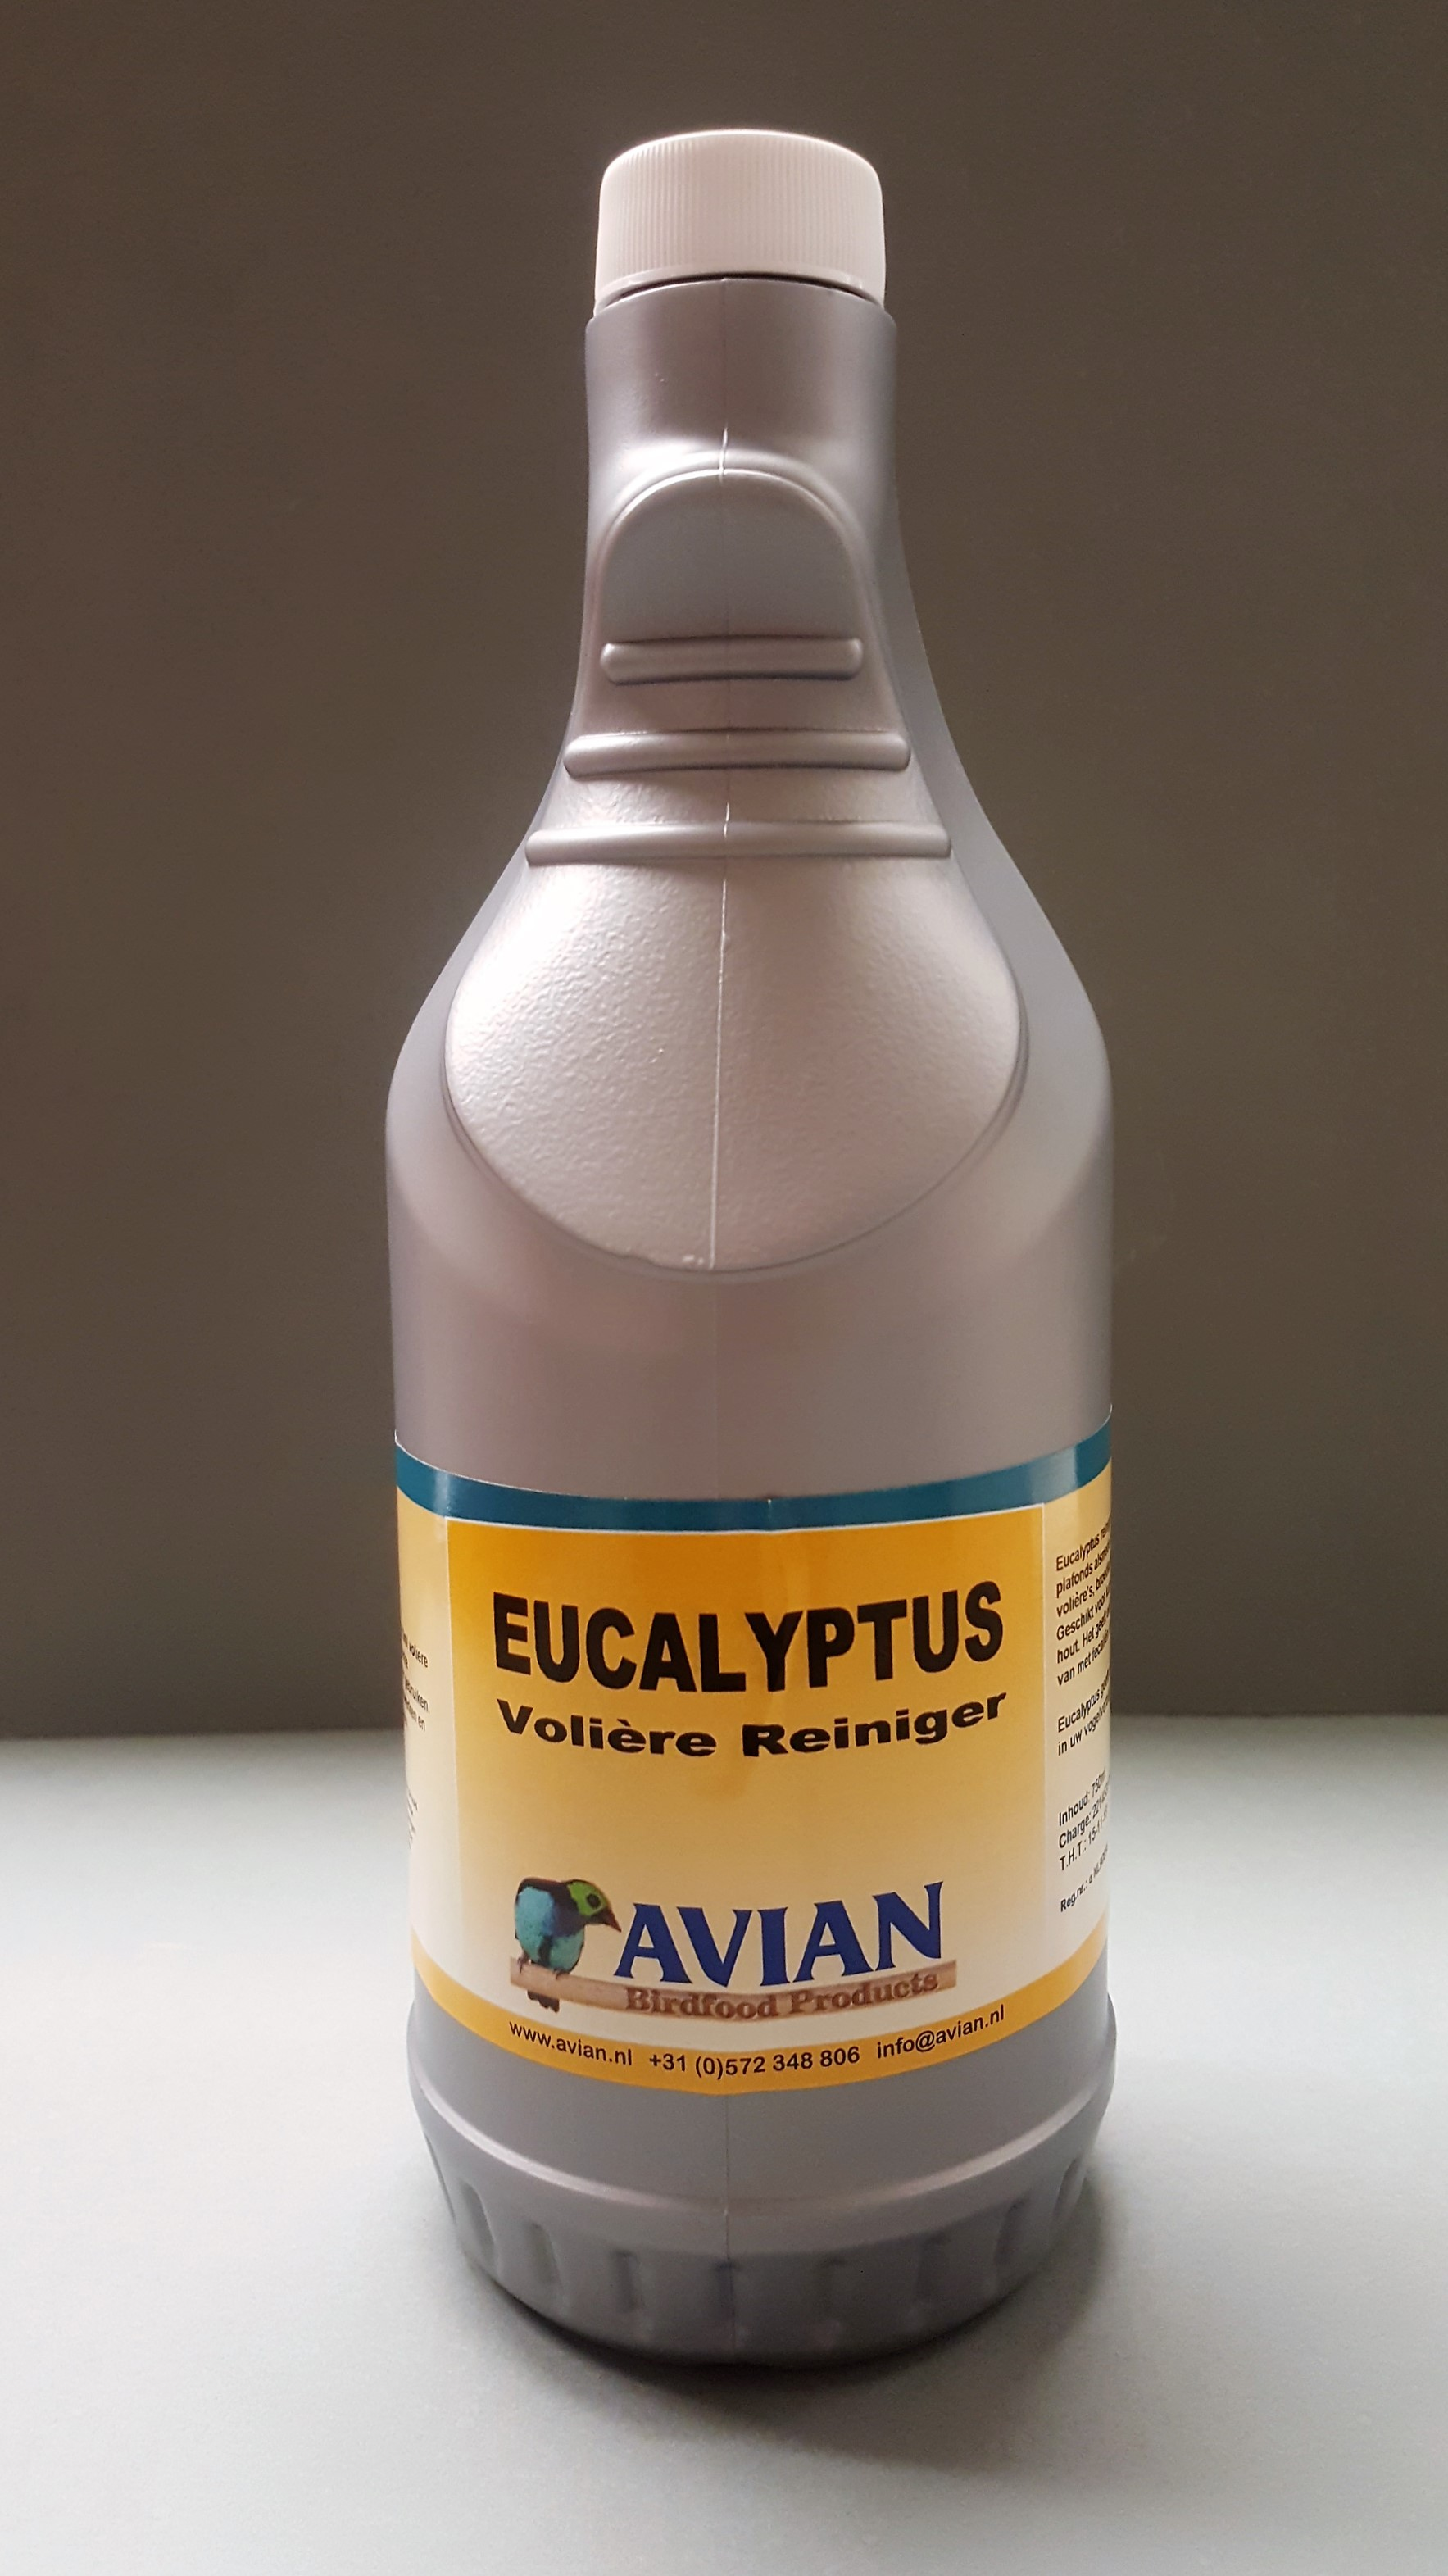 Volière Reiniger Eucalyptus